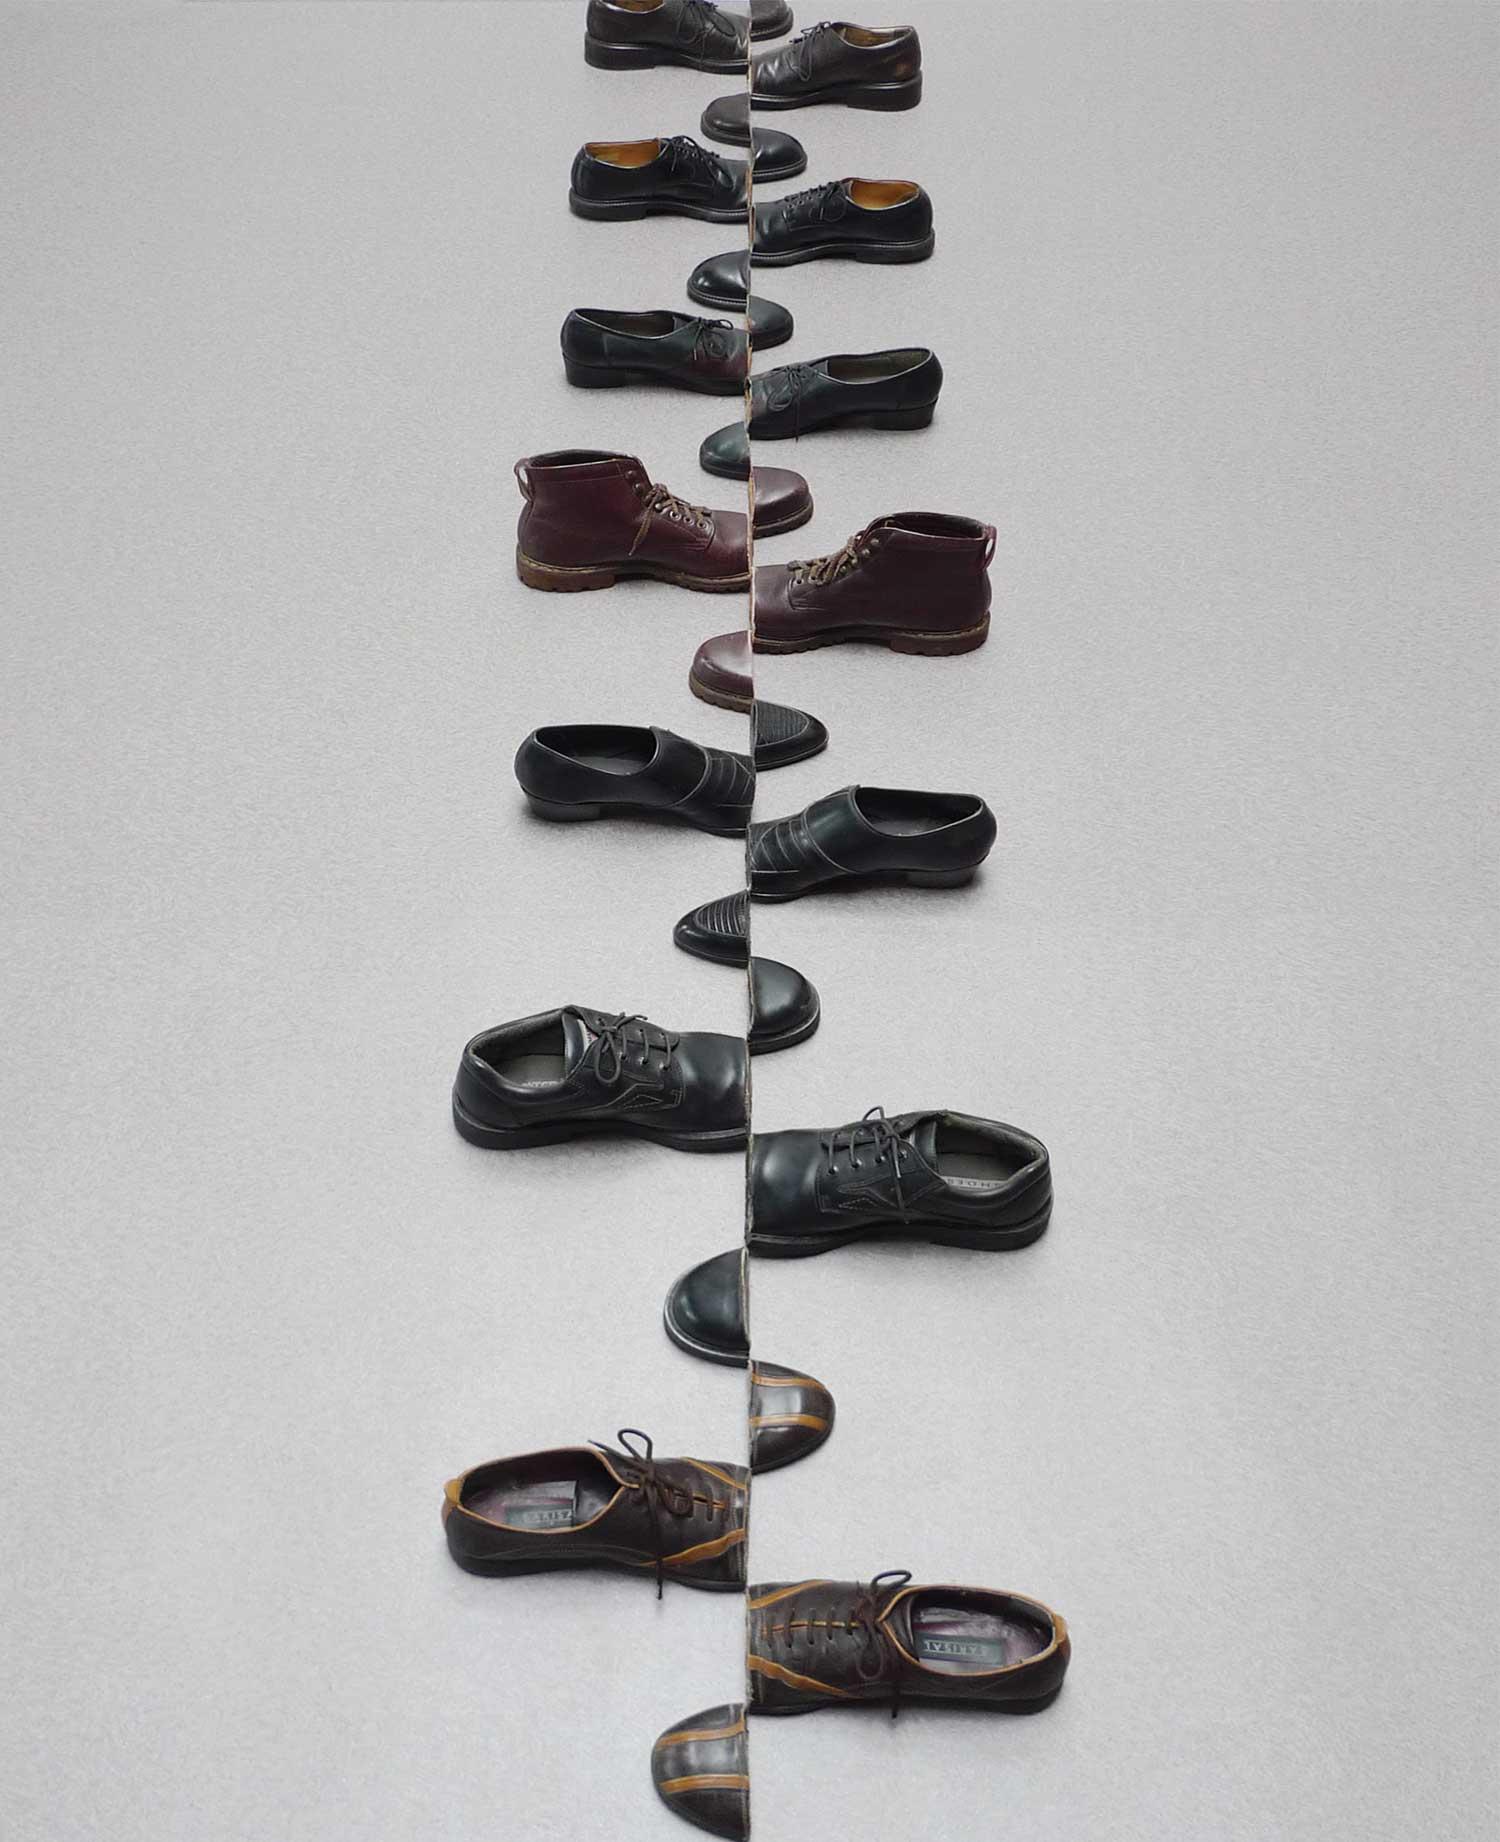 Schuhe mit kunstvollem Schnitt Sakir-Gokcebag-shoes_02